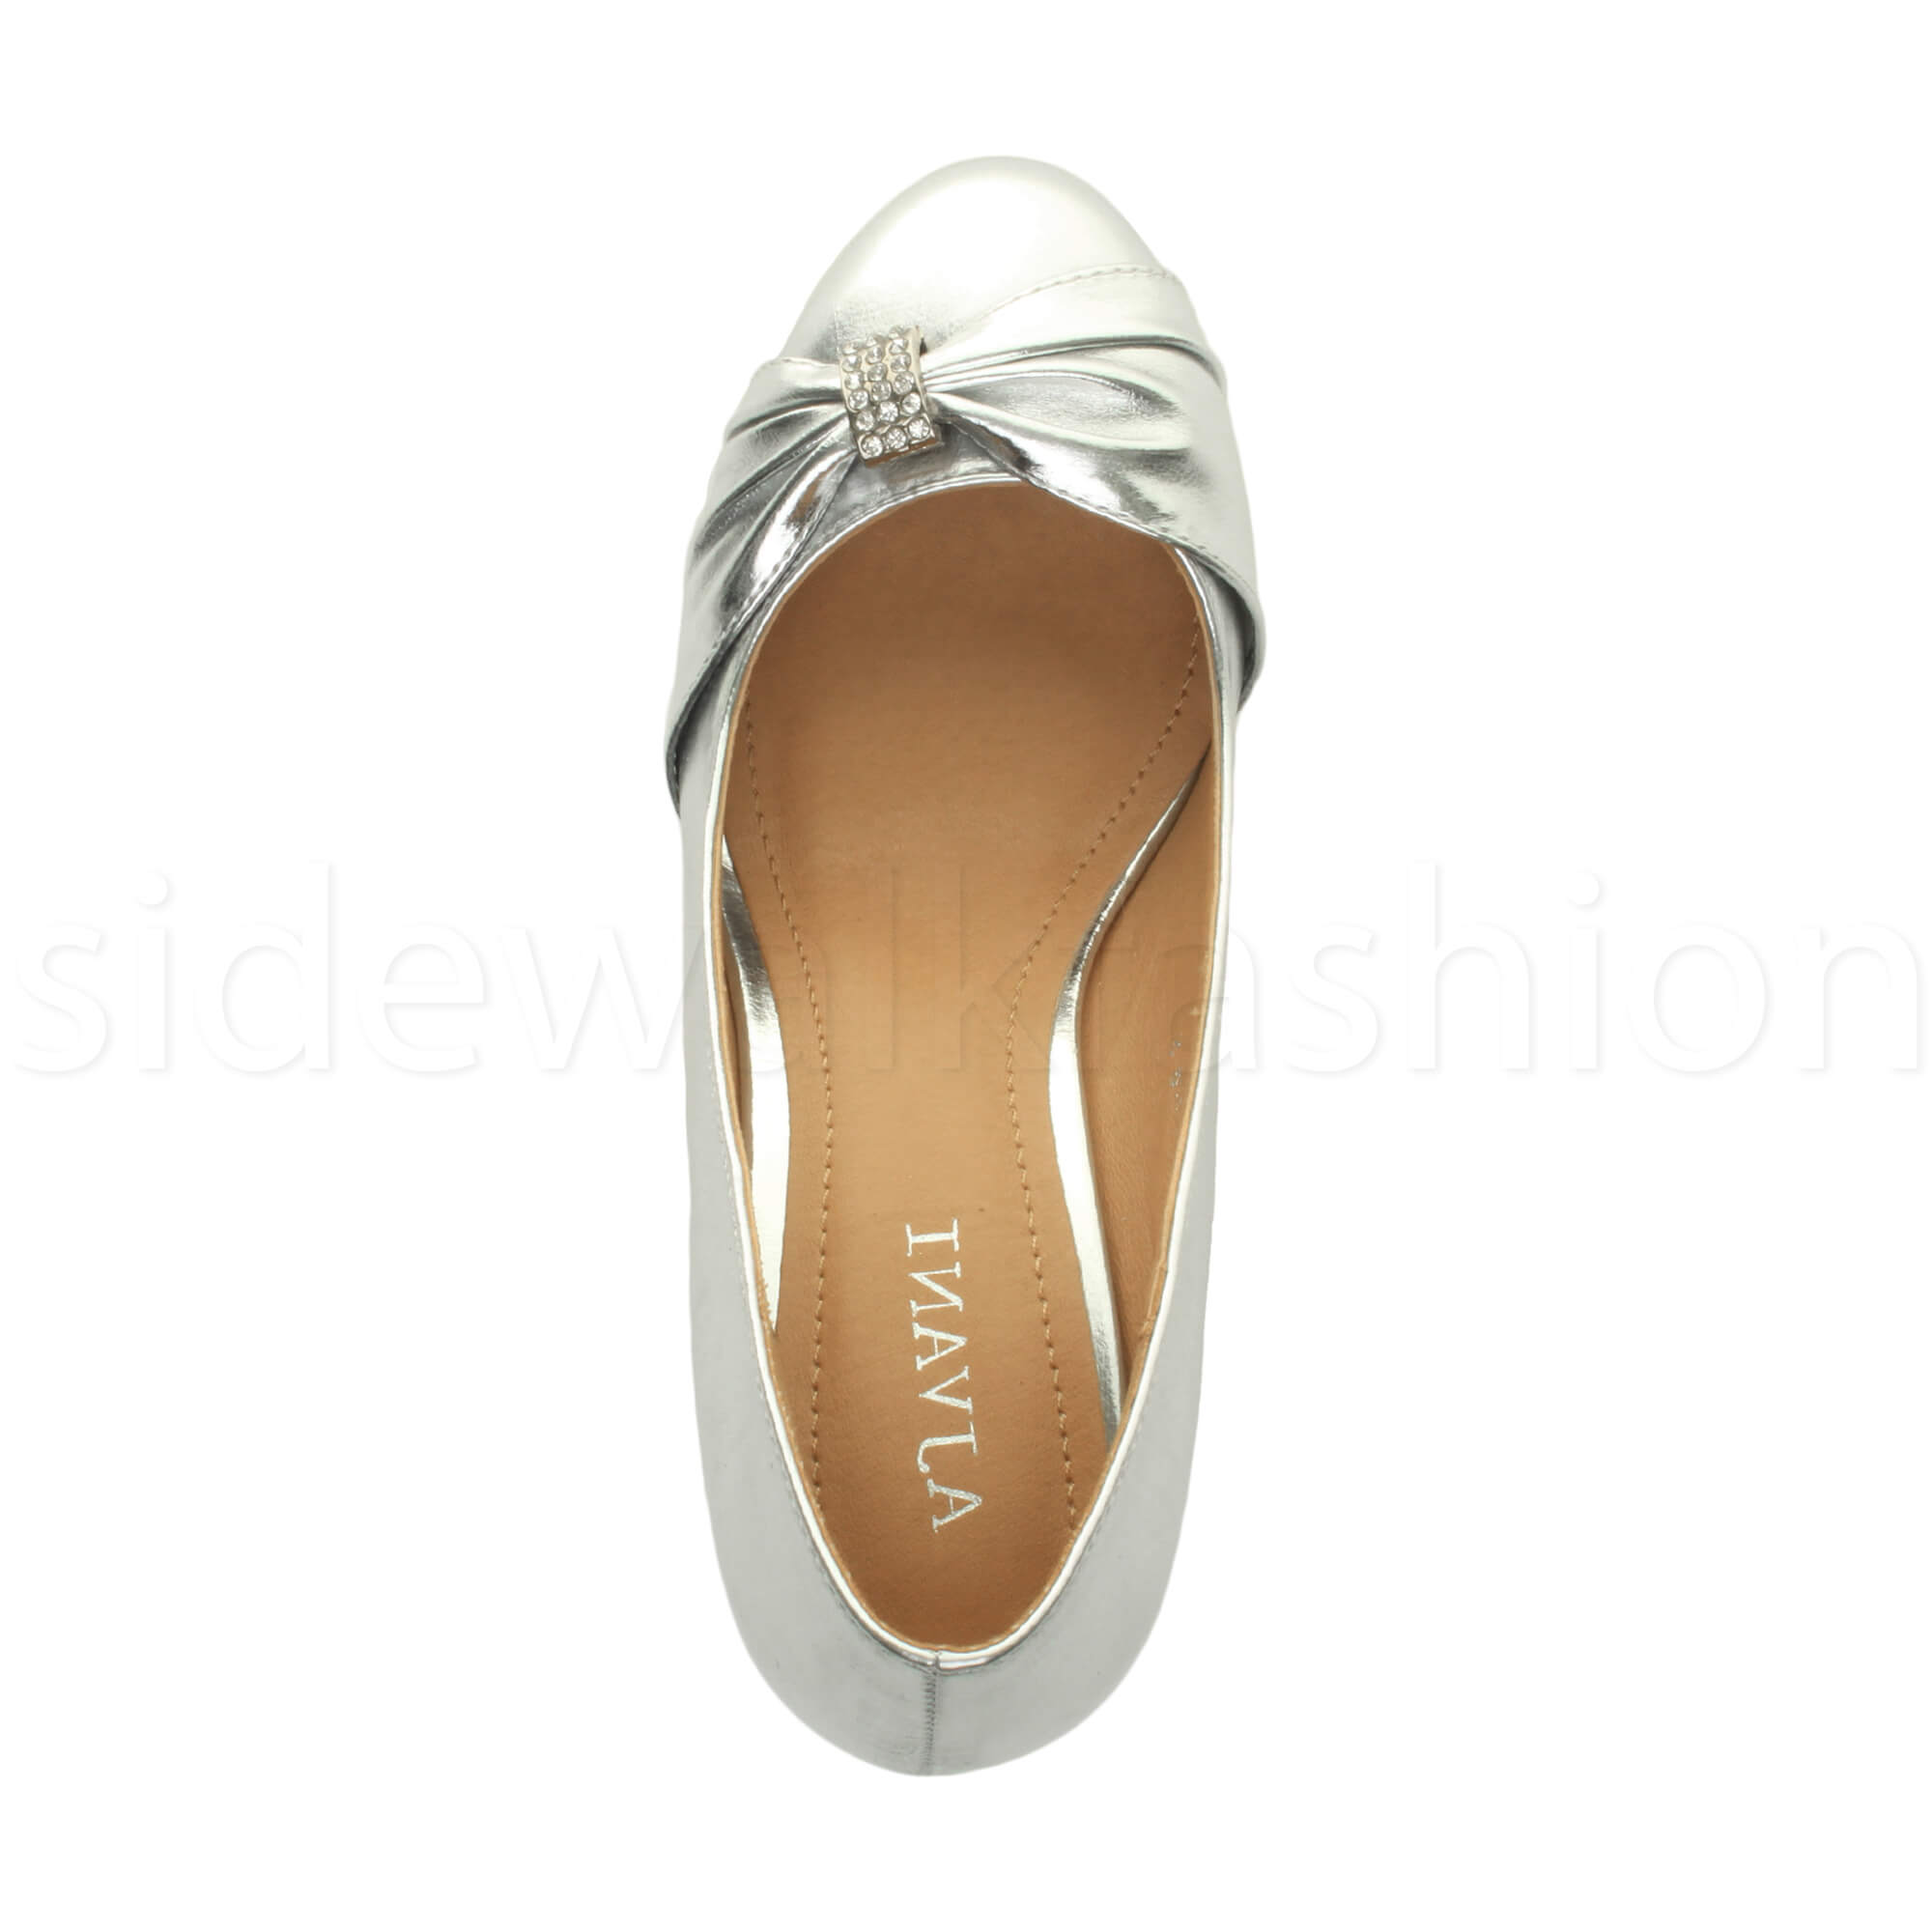 Womens-ladies-low-mid-heel-diamante-party-smart-evening-court-shoes-size thumbnail 88